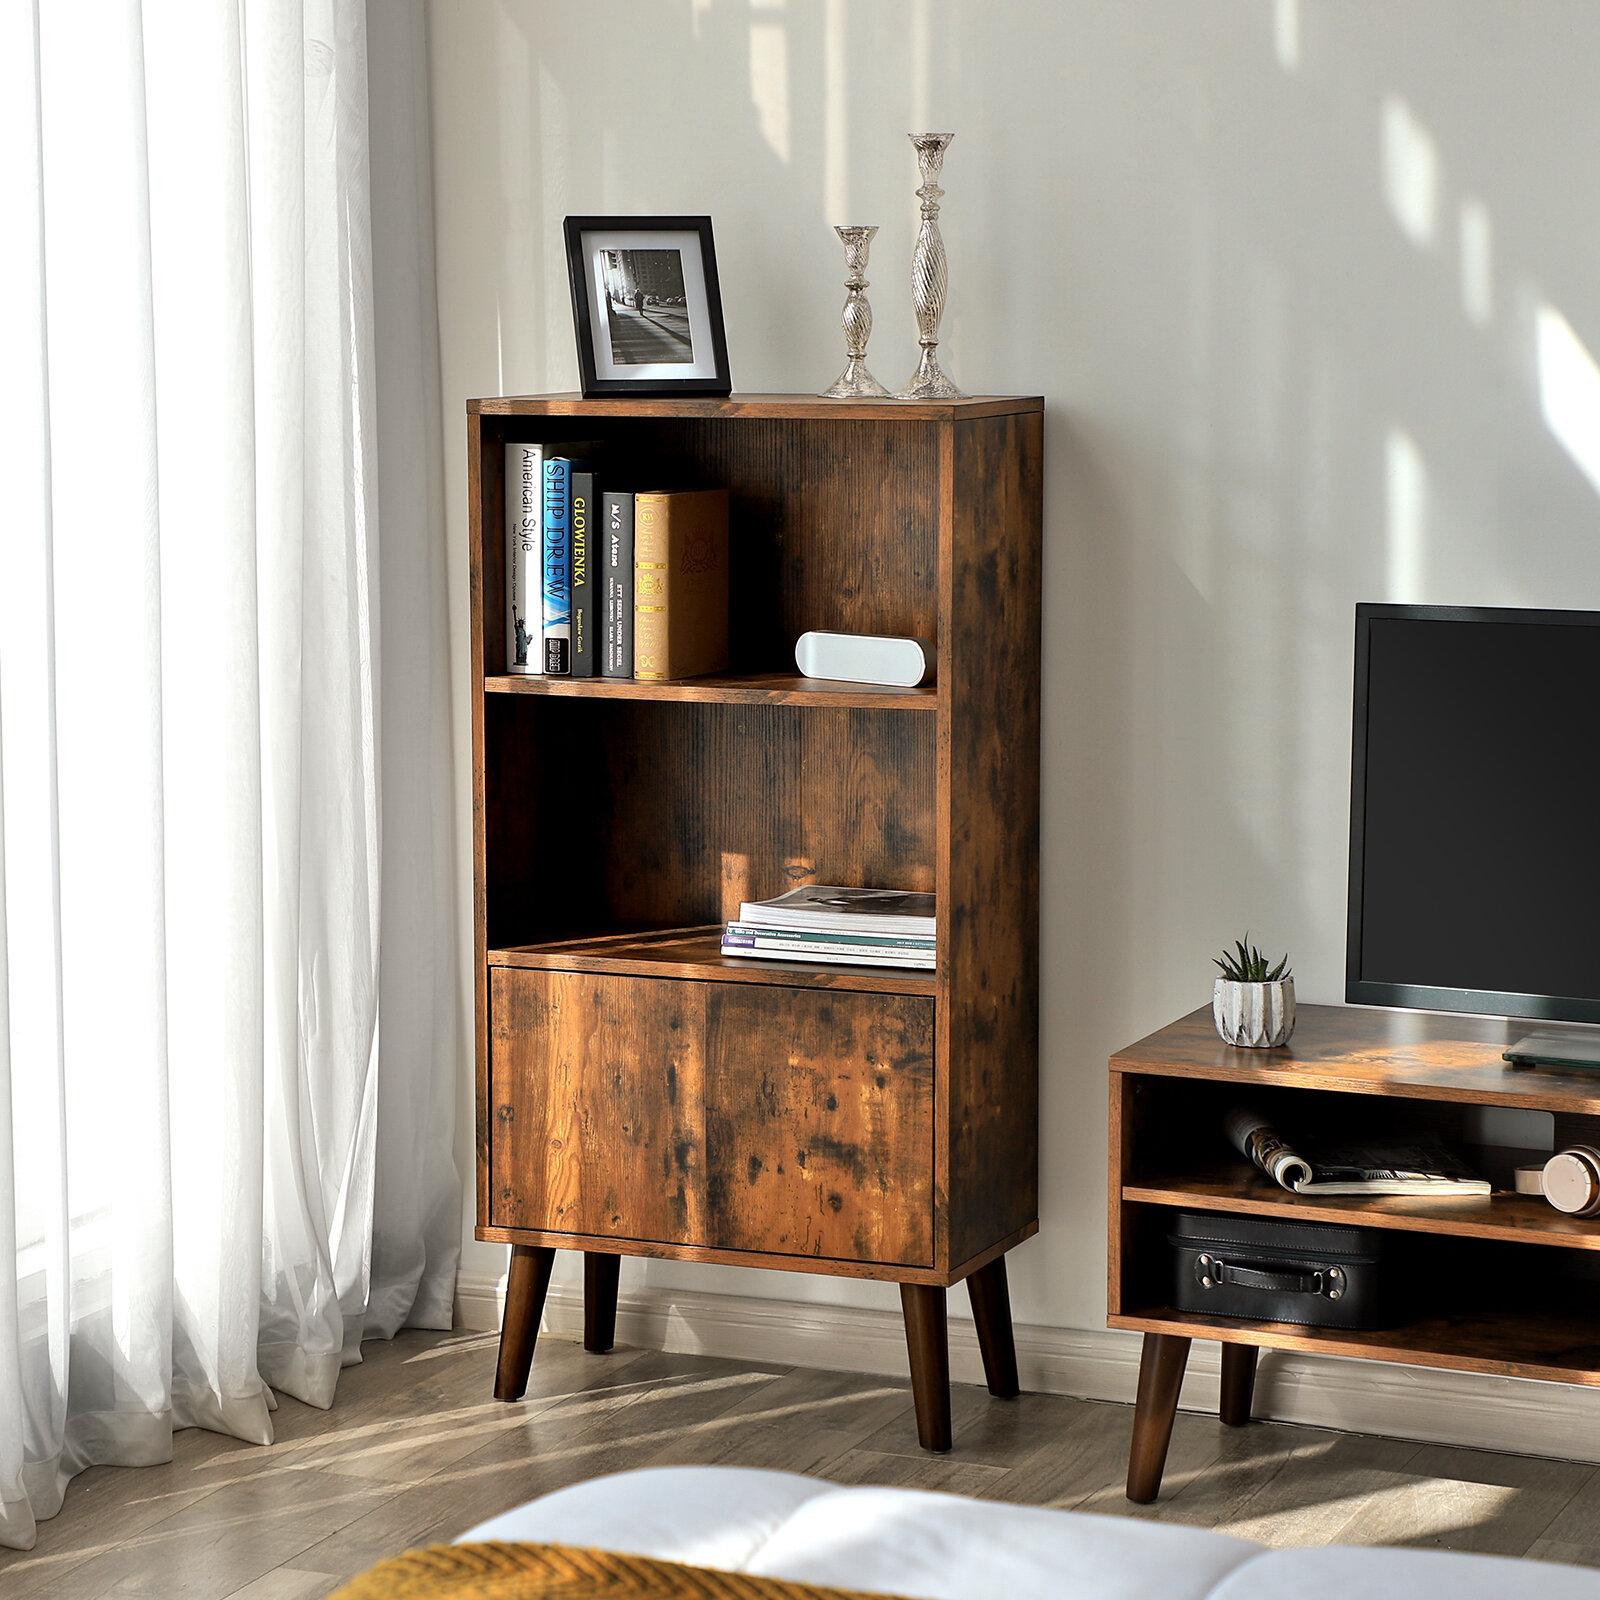 Millwood Pines Wethersfield Standard Bookcase Reviews Wayfair